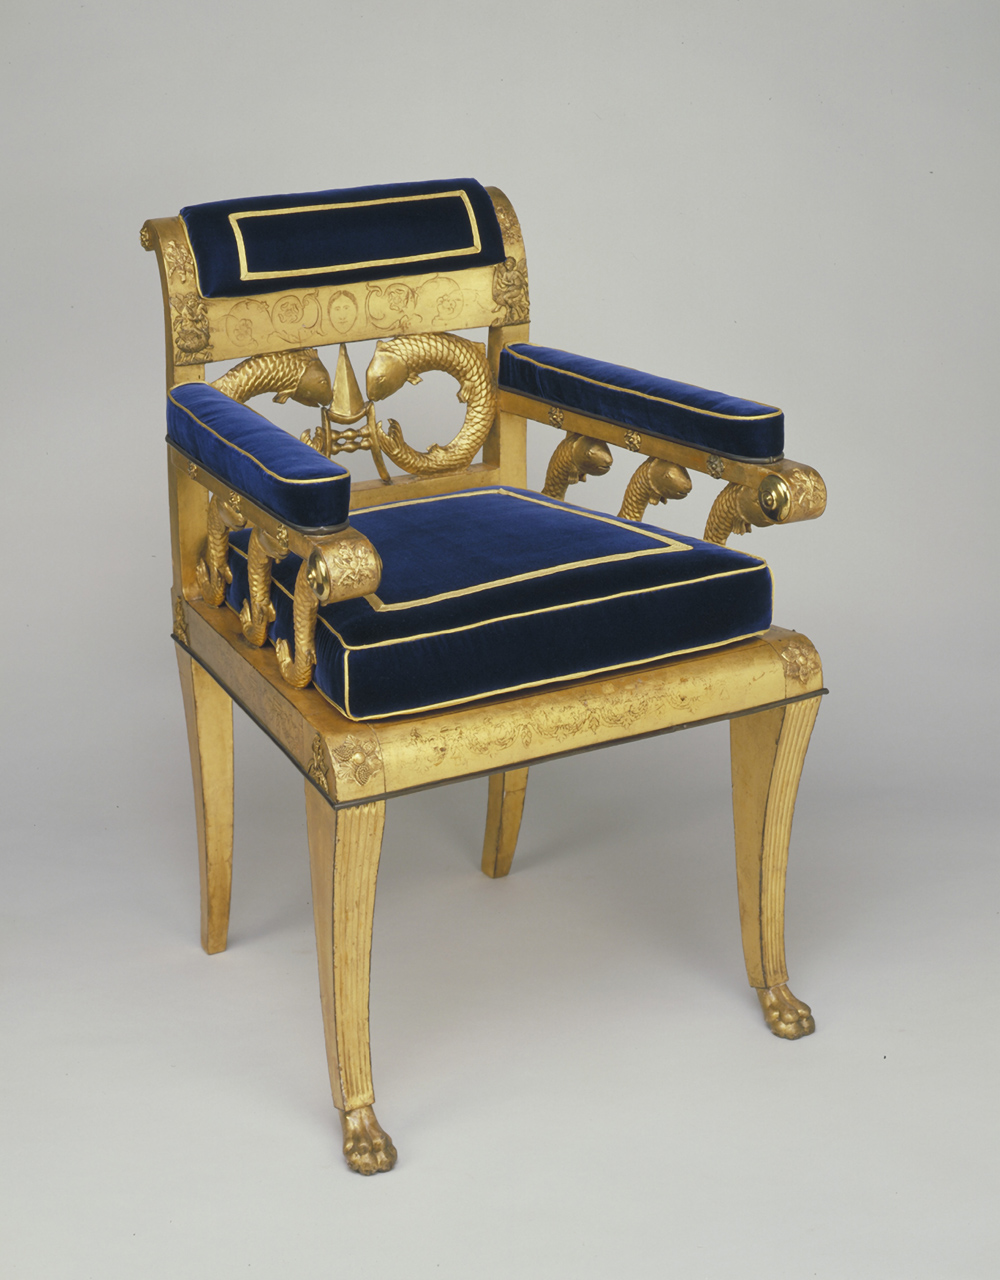 v&a dundee Throne chair